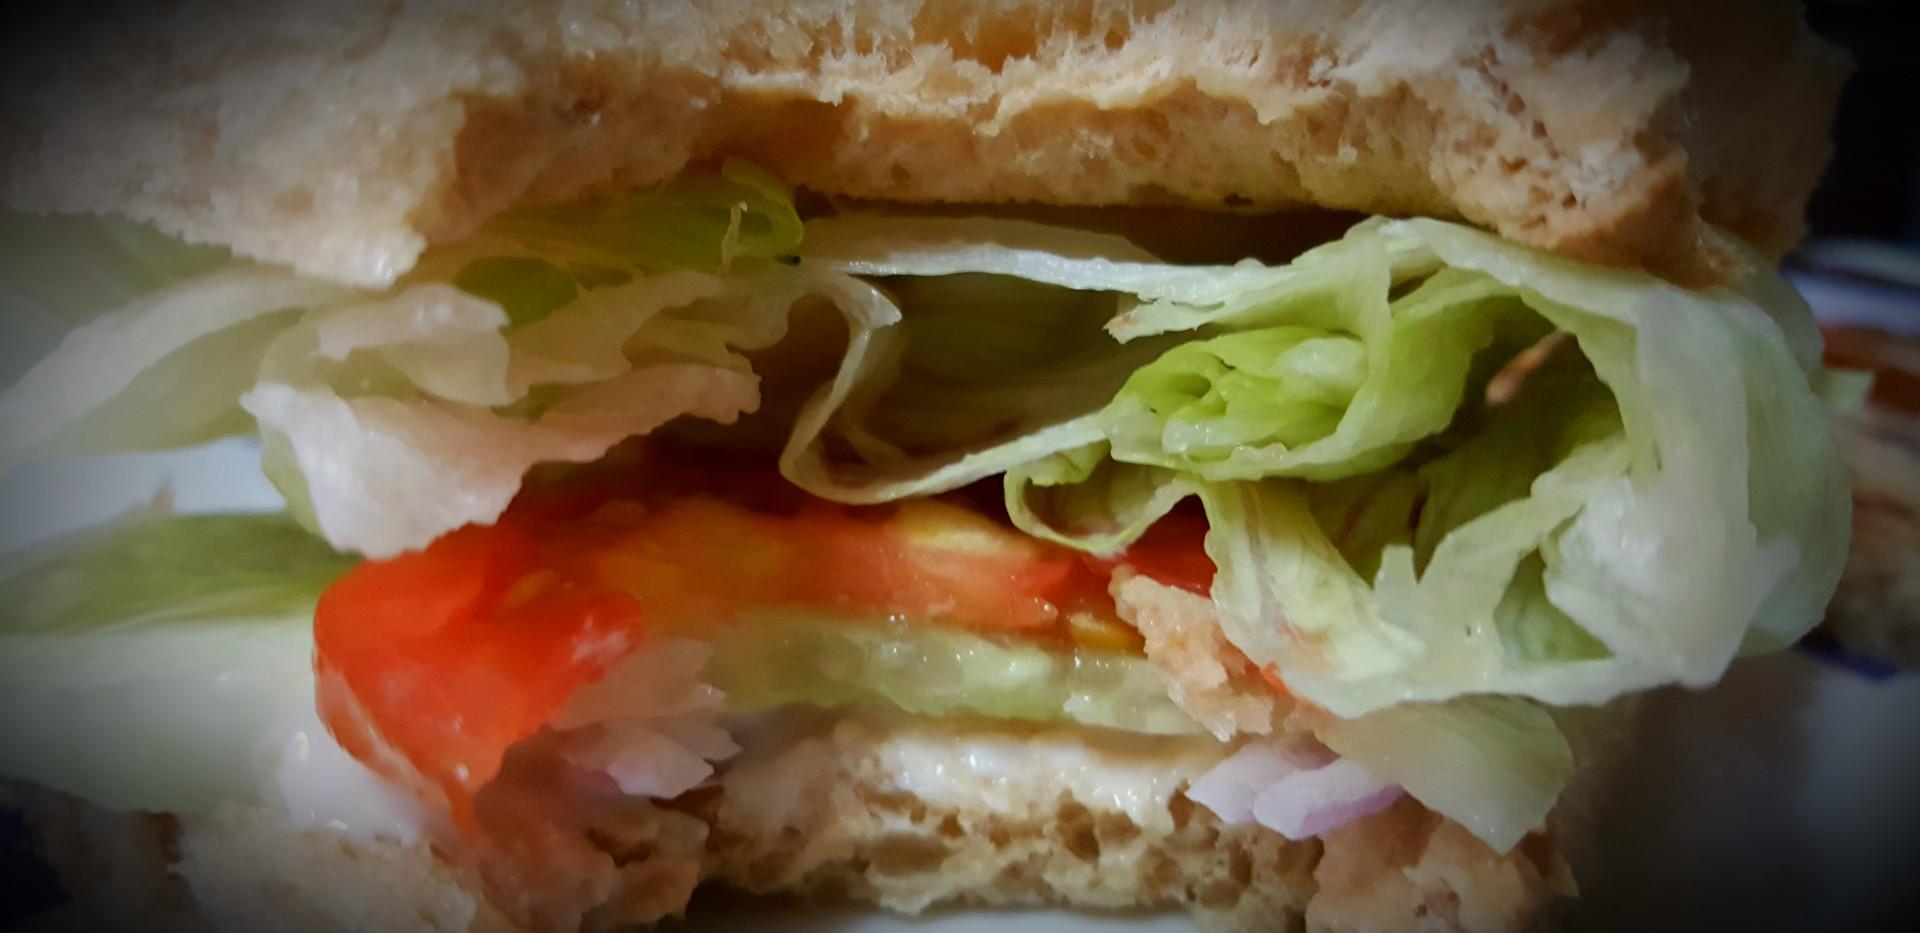 Vege Burger - Mac D style